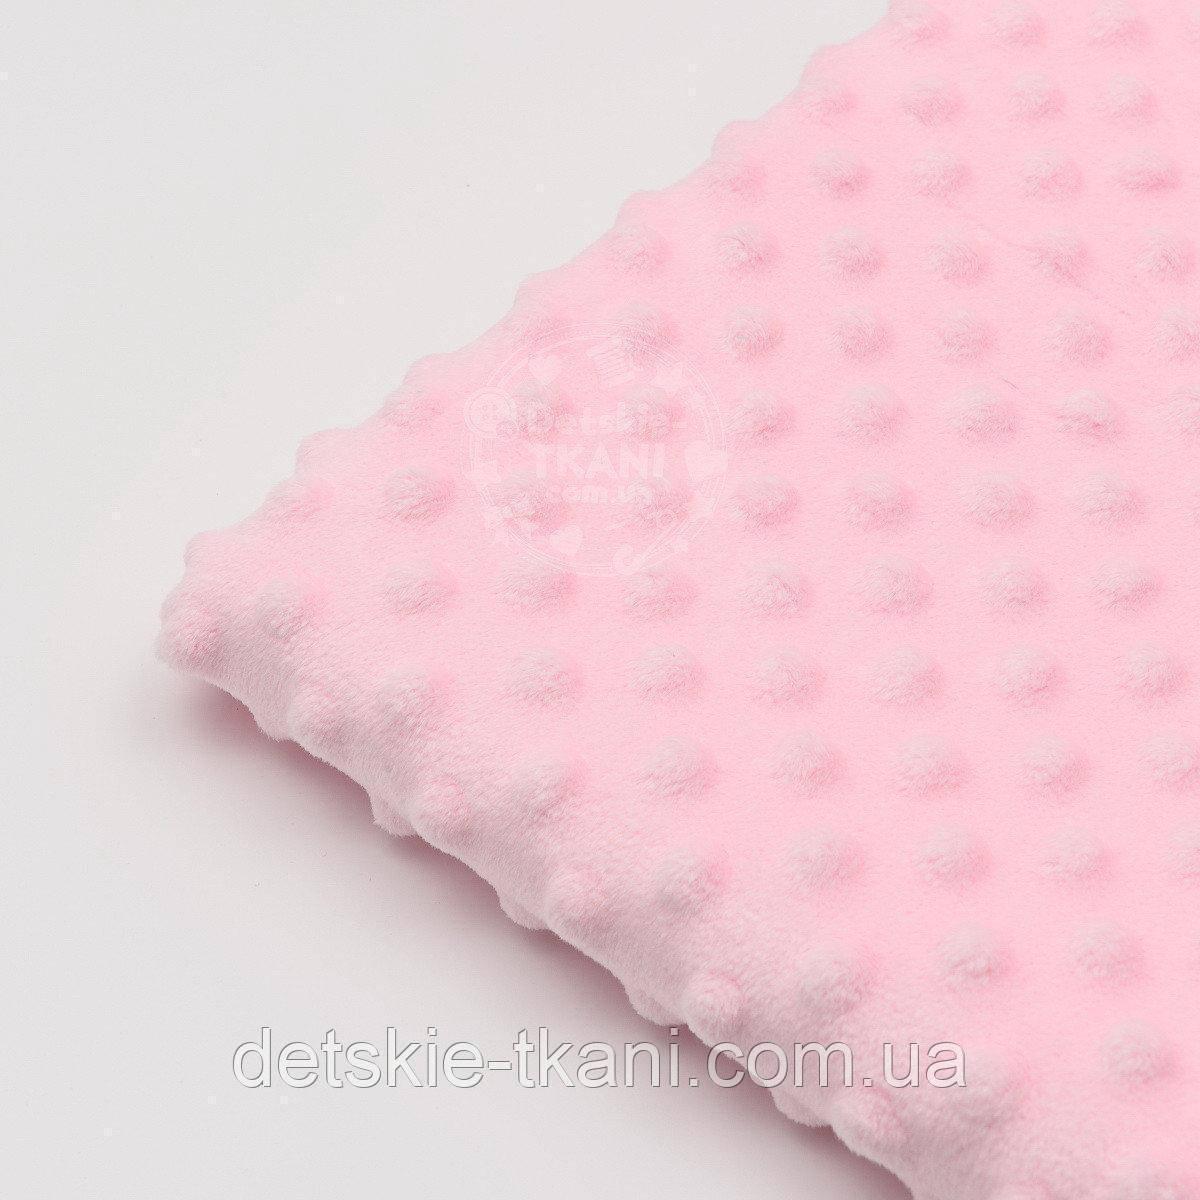 Лоскут плюша minky М-6 цвет светло розовый, размер 15*160 см